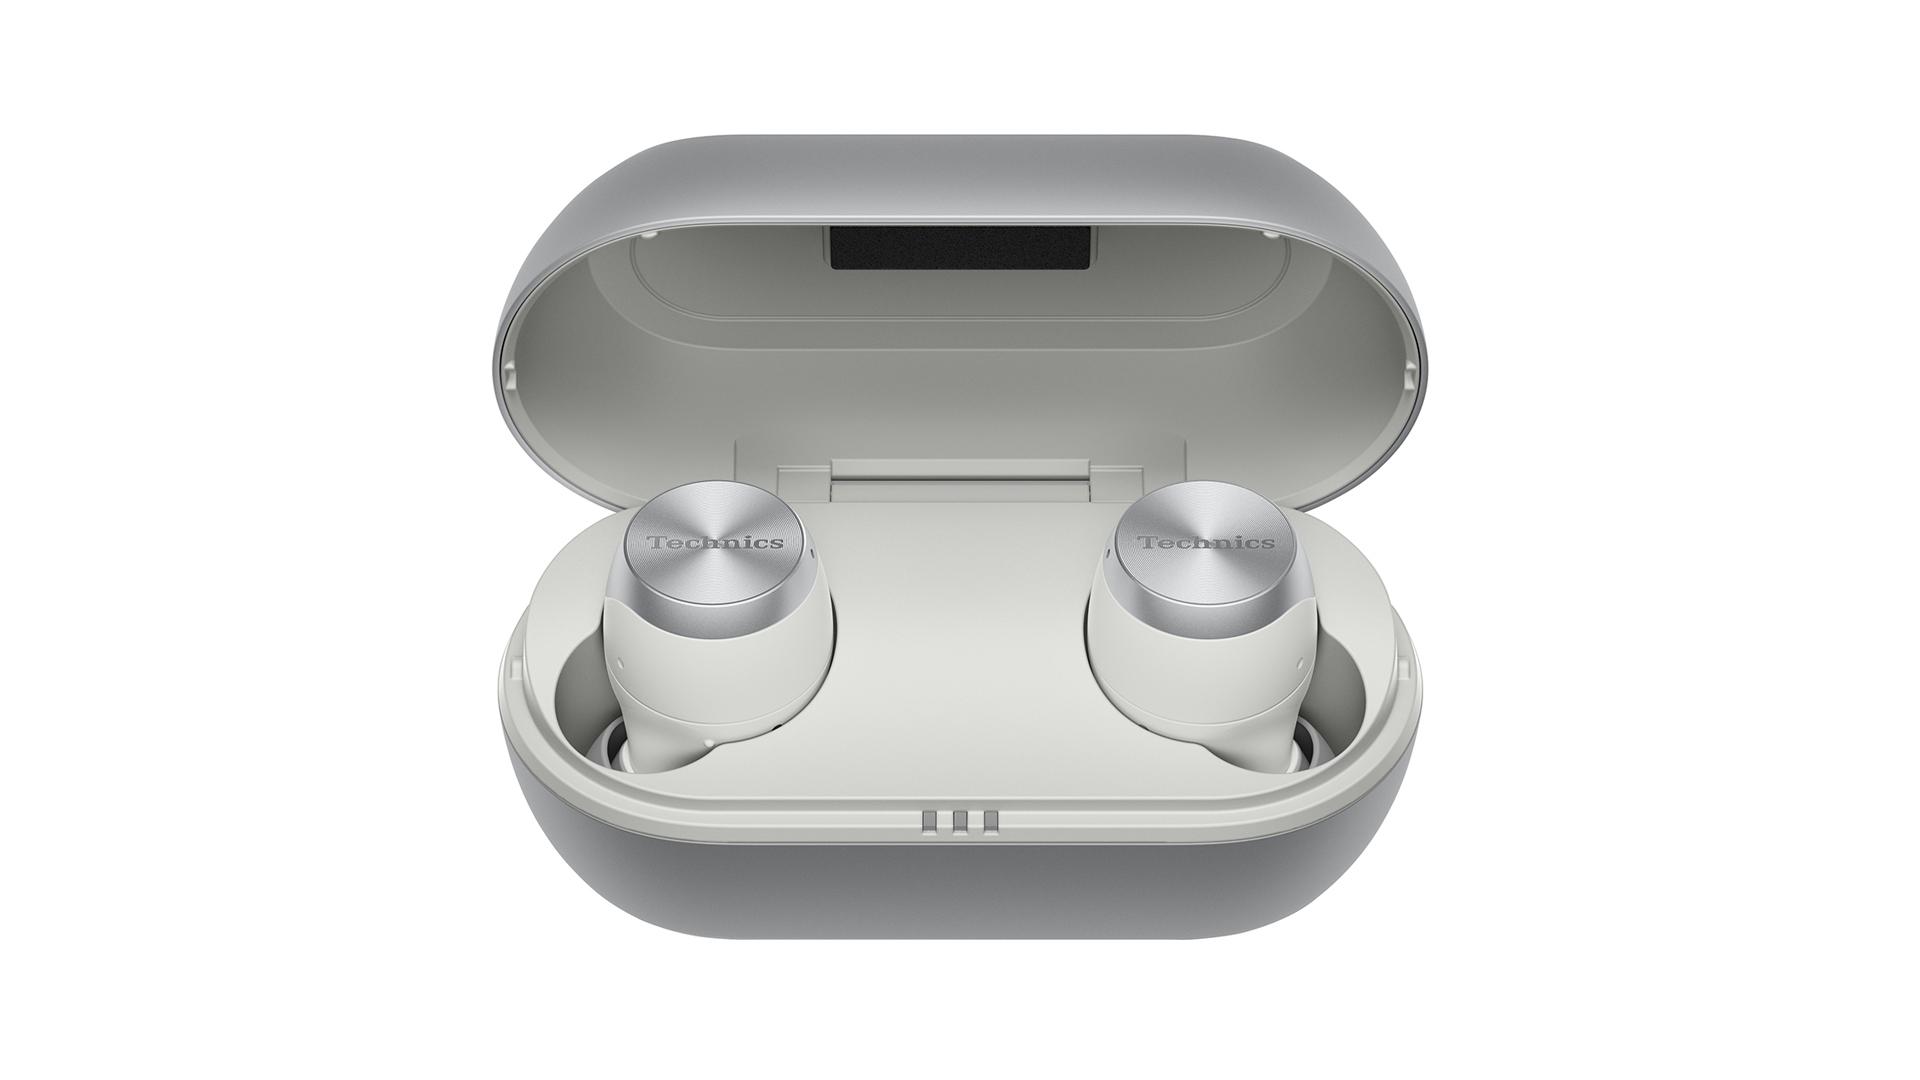 Technics EAH-AZ70W review | What Hi-Fi?